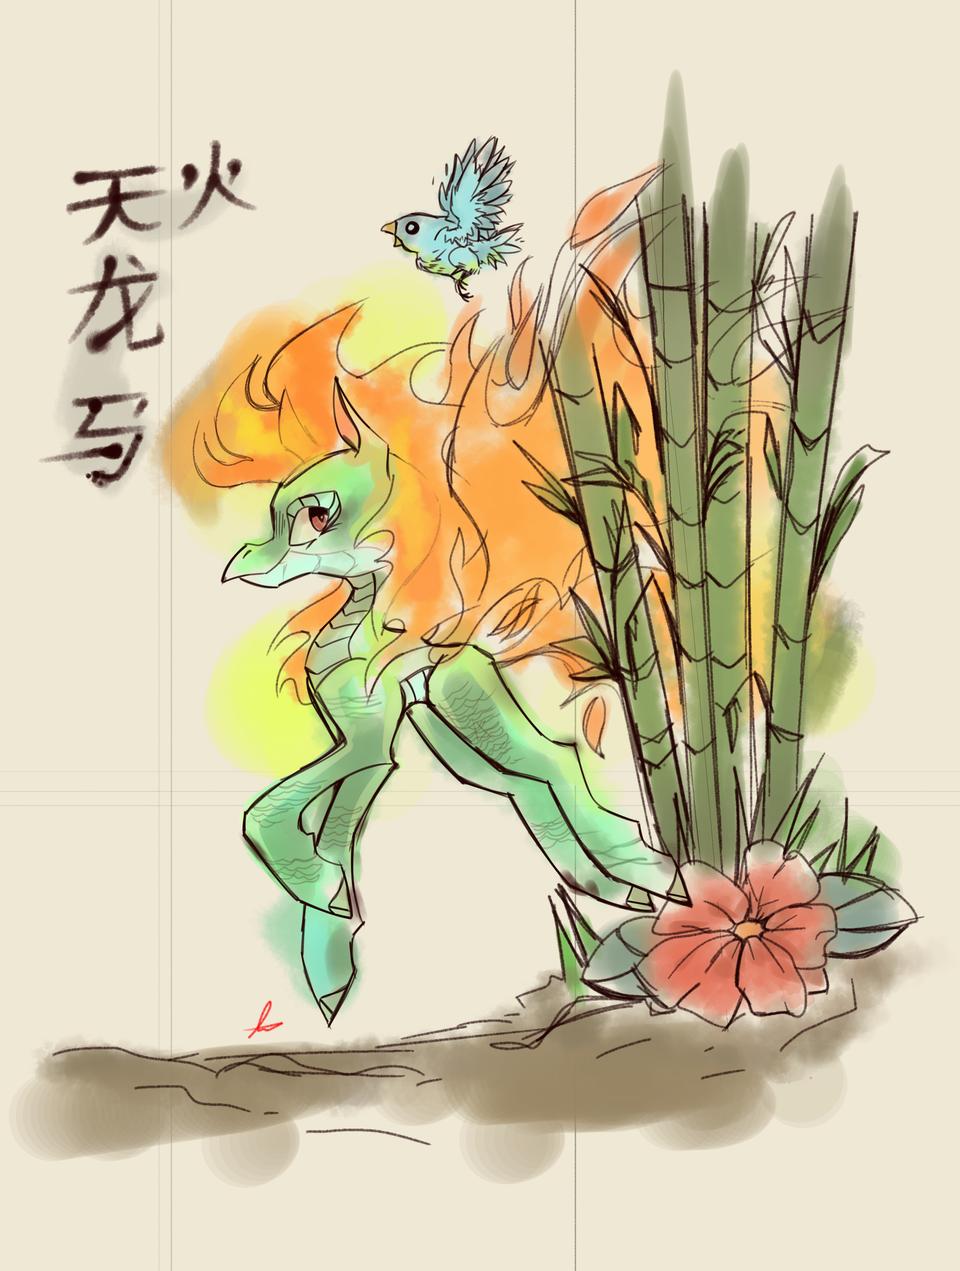 Lukisan gaya Tionghoa :v Illust of Squiggle Liggle medibangpaint dragon chinese art